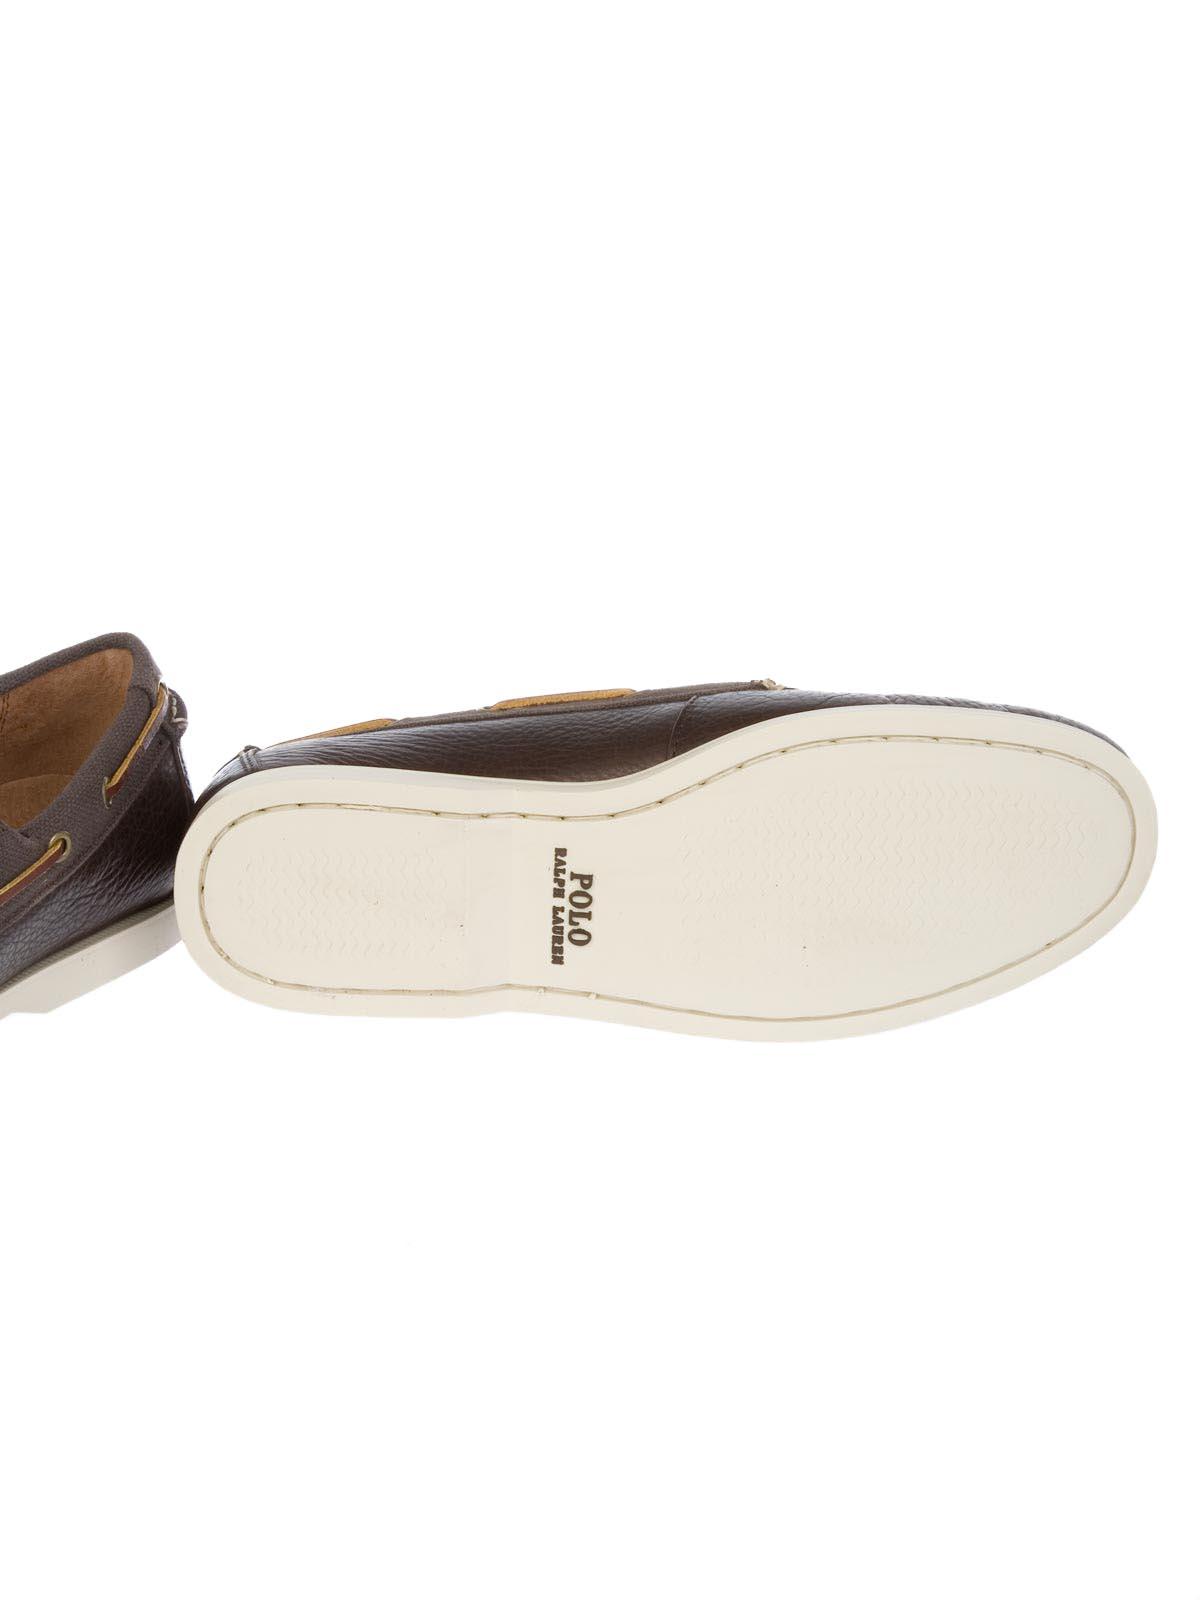 Picture of POLO RALPH LAUREN | Bienne II Shoe